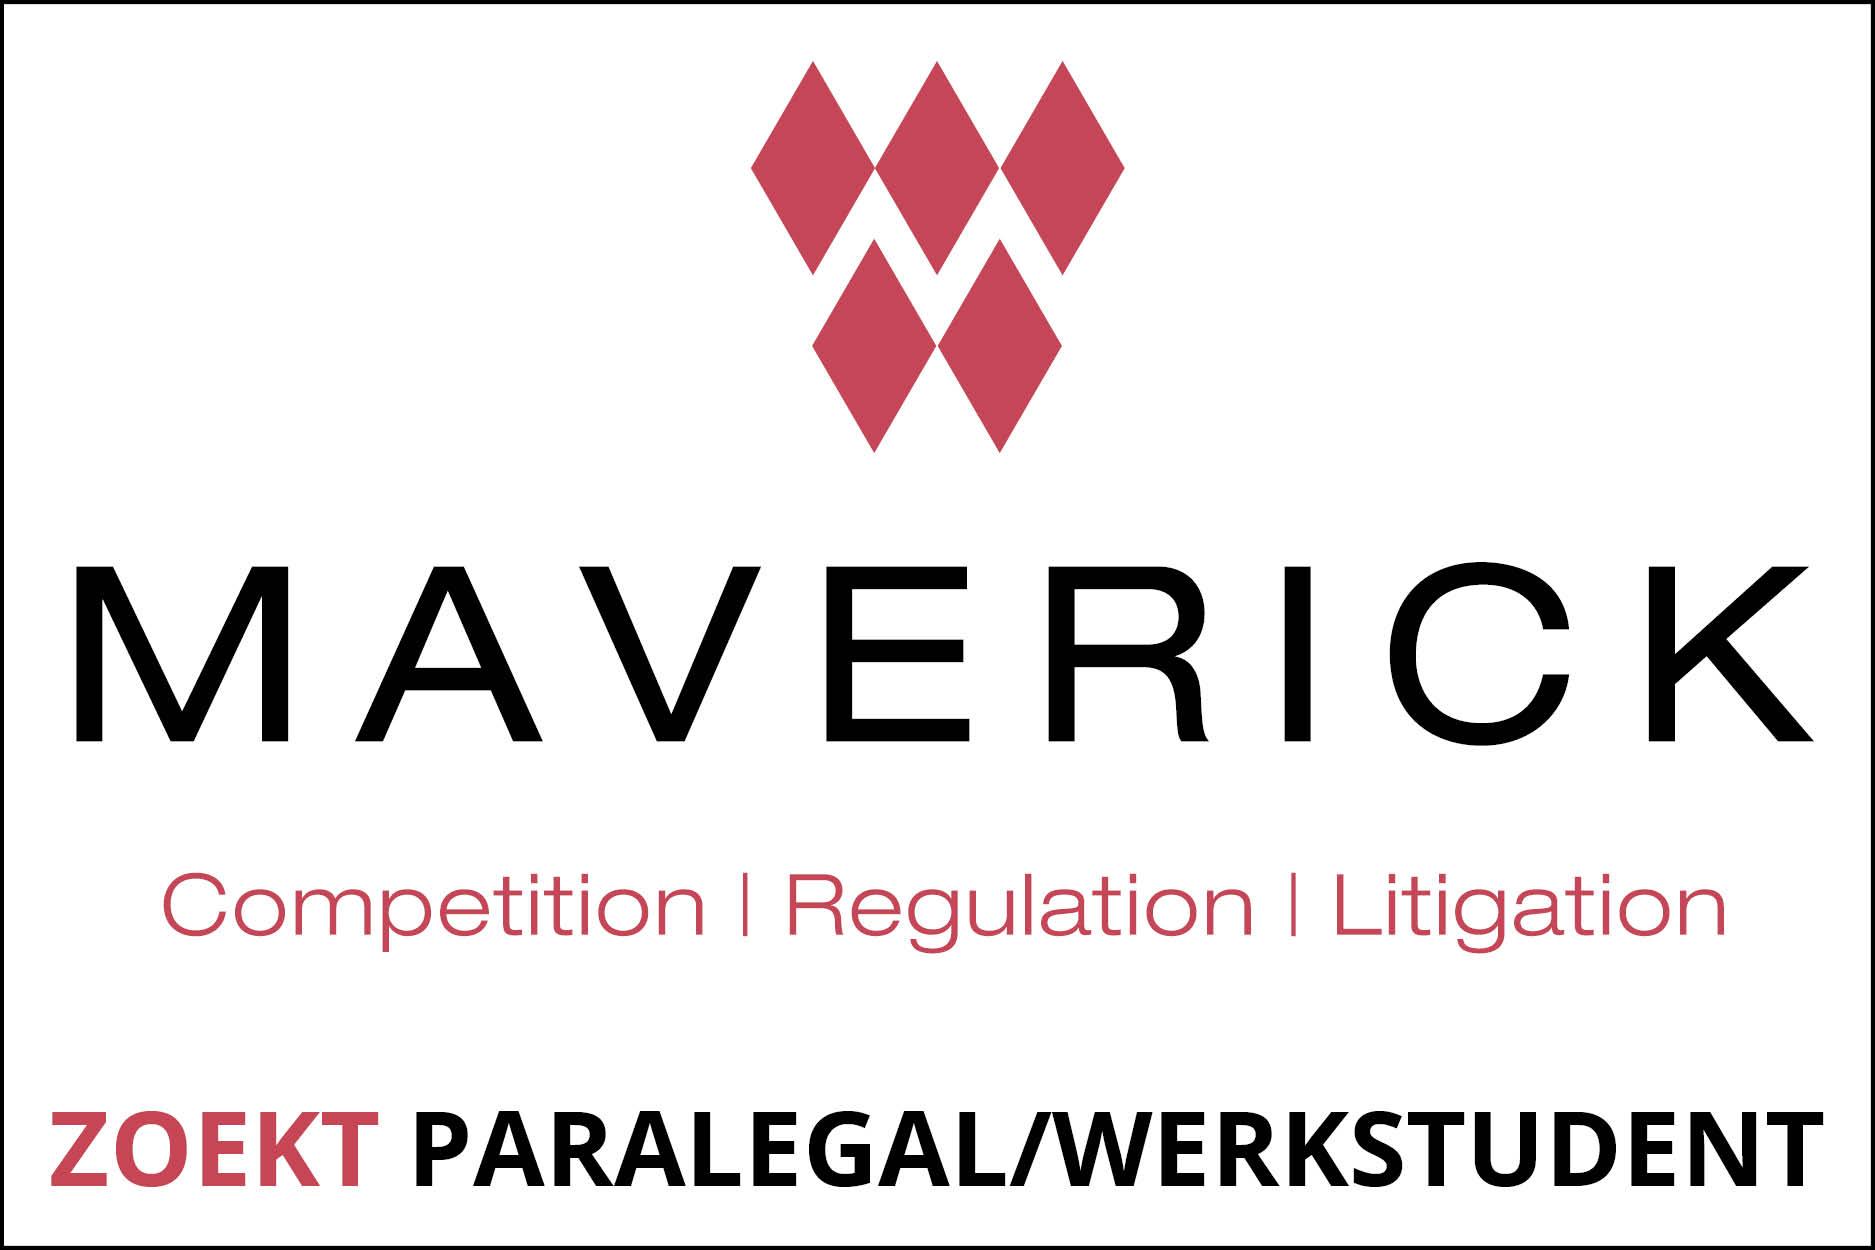 Banner Maverick